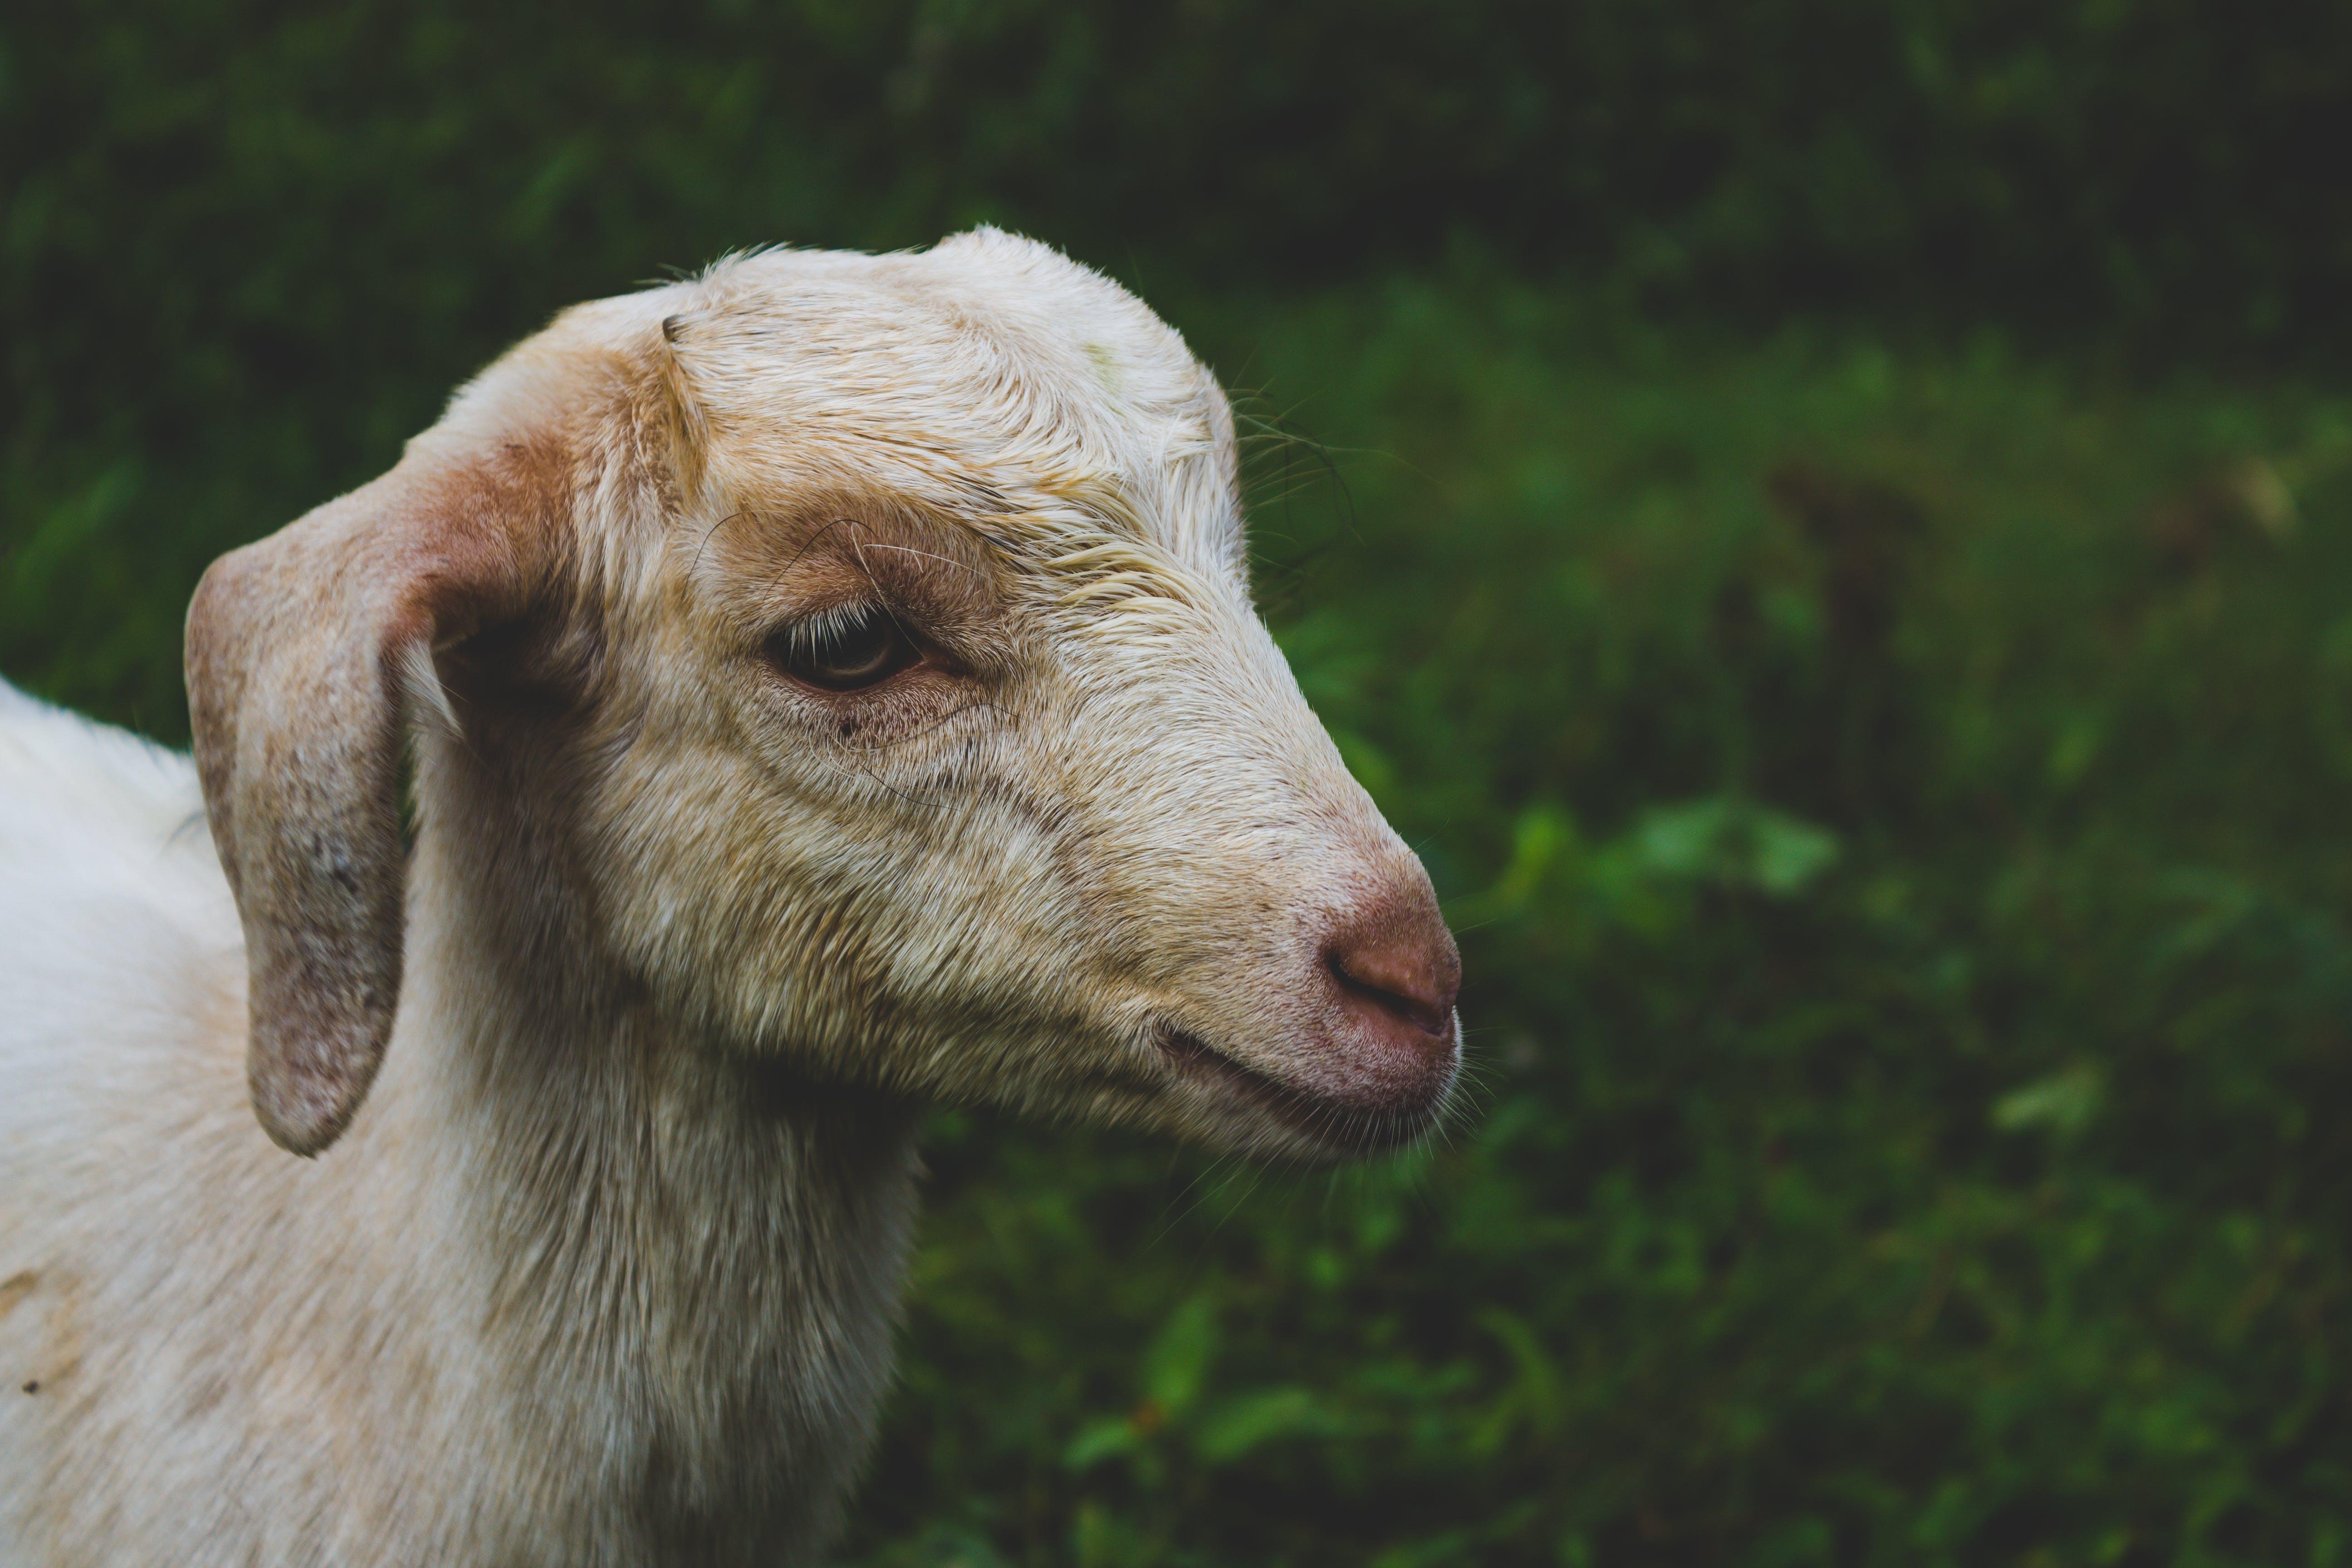 White Goat in Shallow-focus Shot